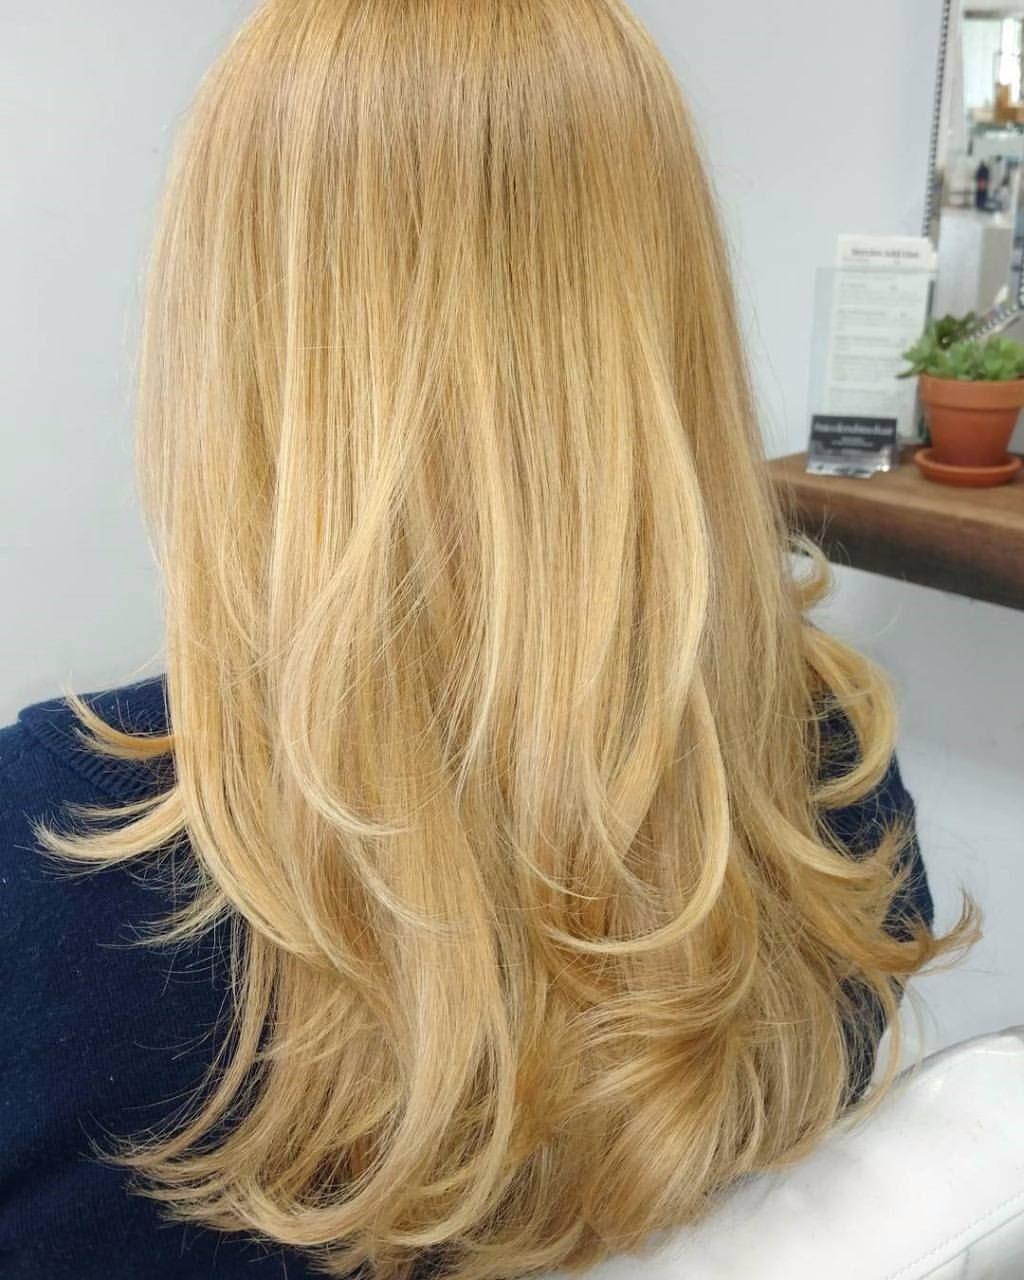 Sunset Blonde 9.0 + 20 Volume Developer Highlights with